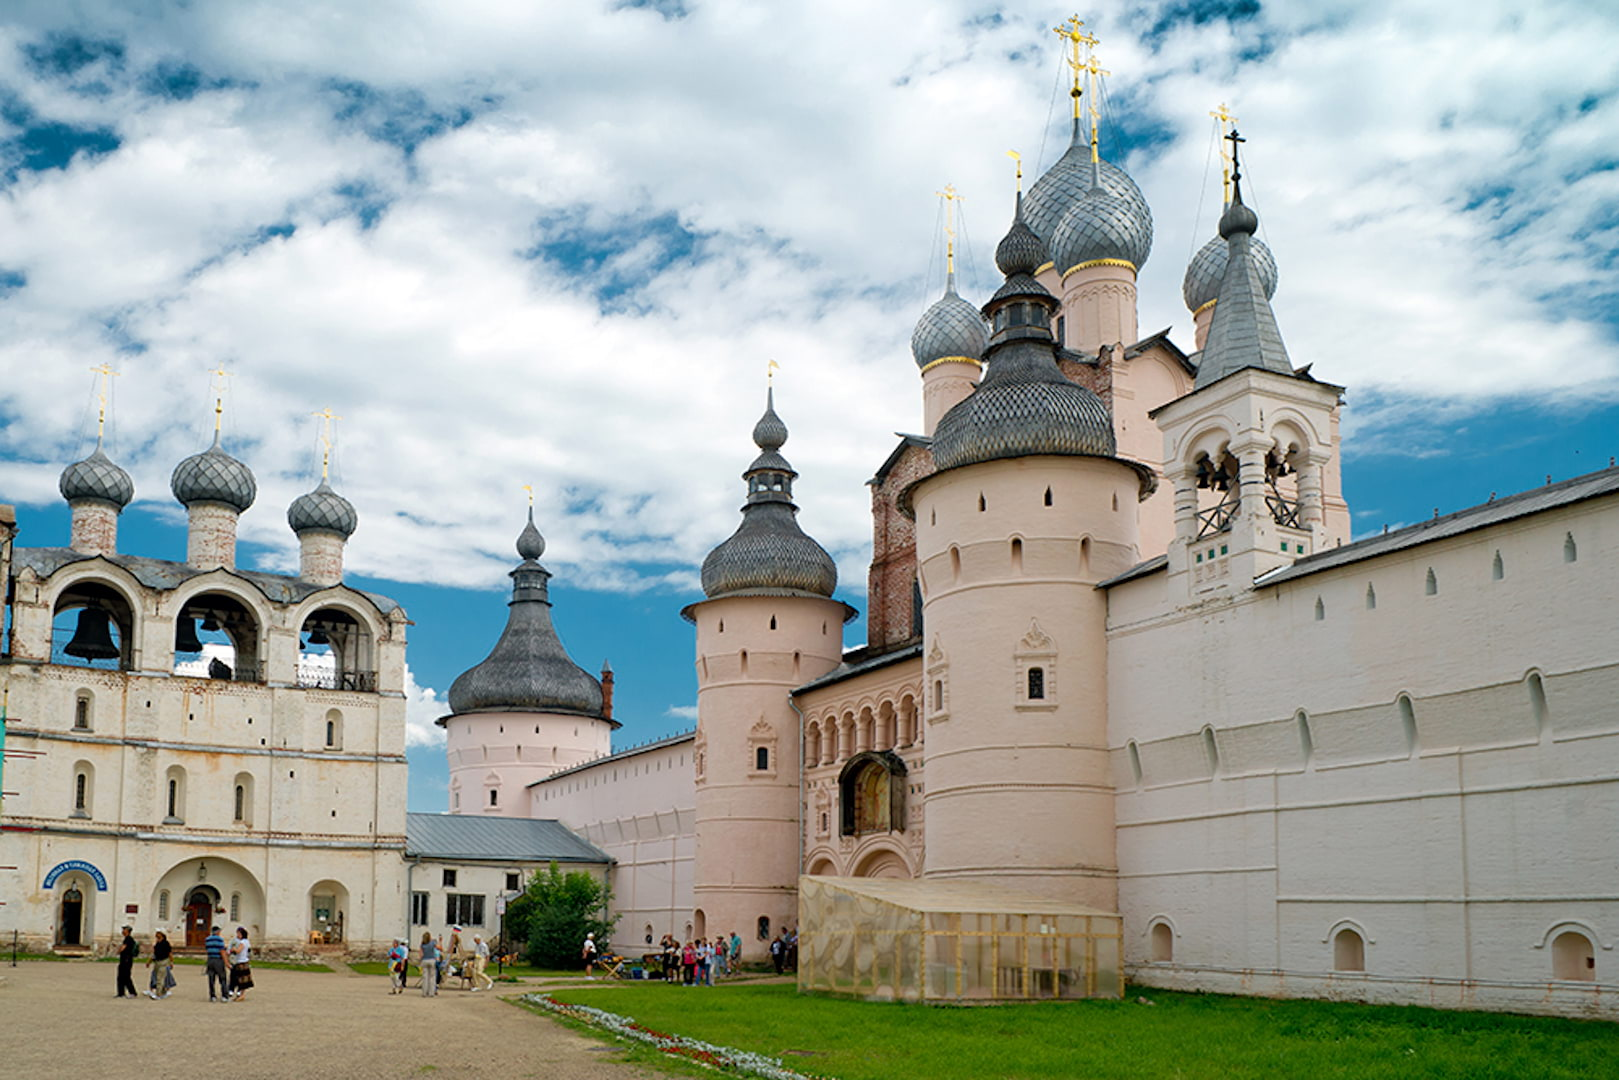 Фото храма в России